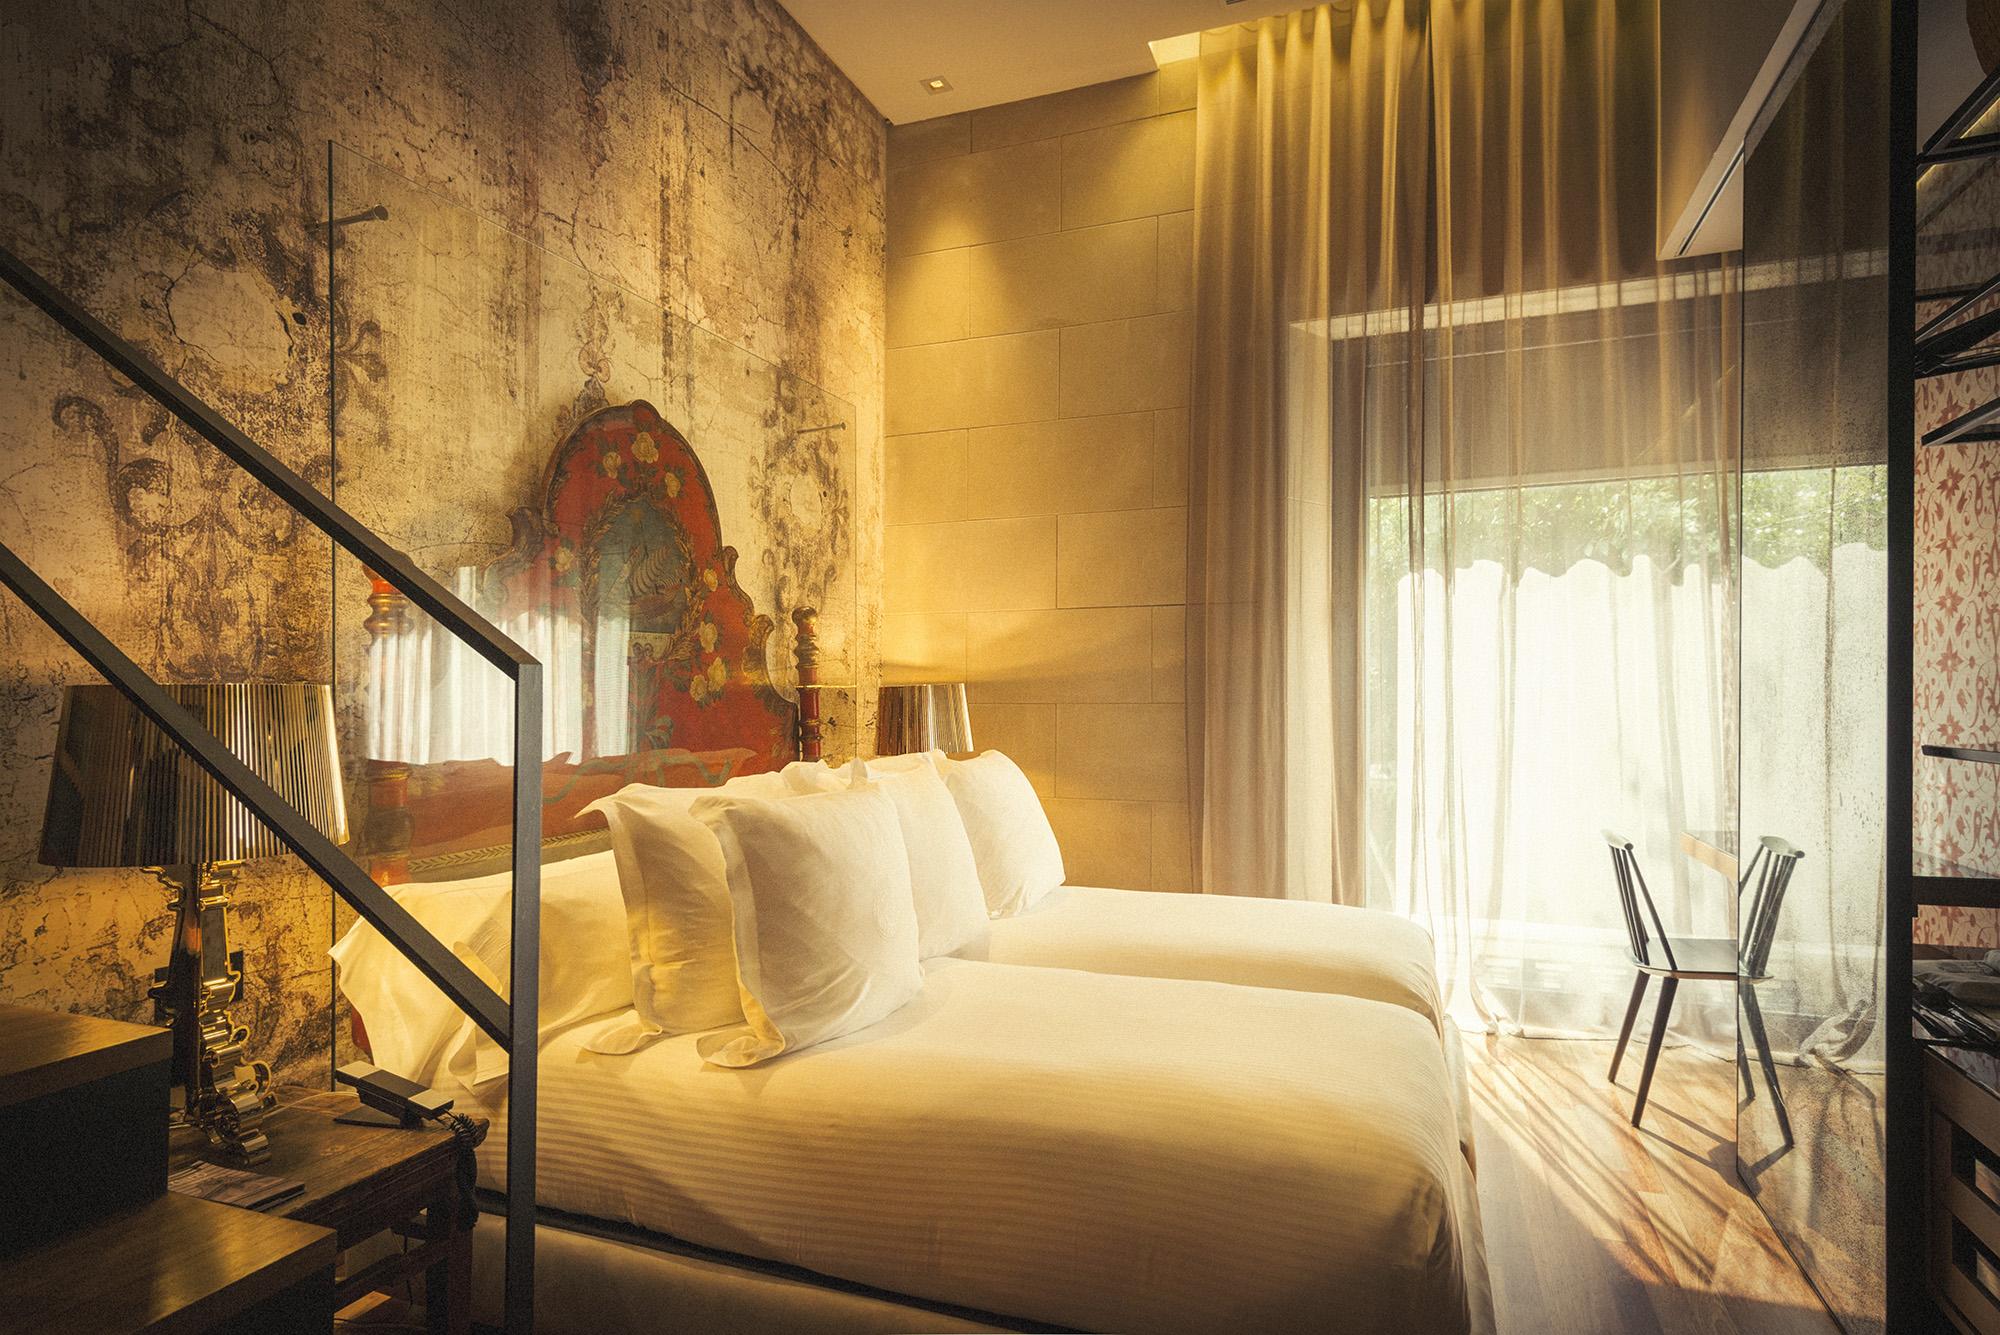 HOTELS_0150.jpg